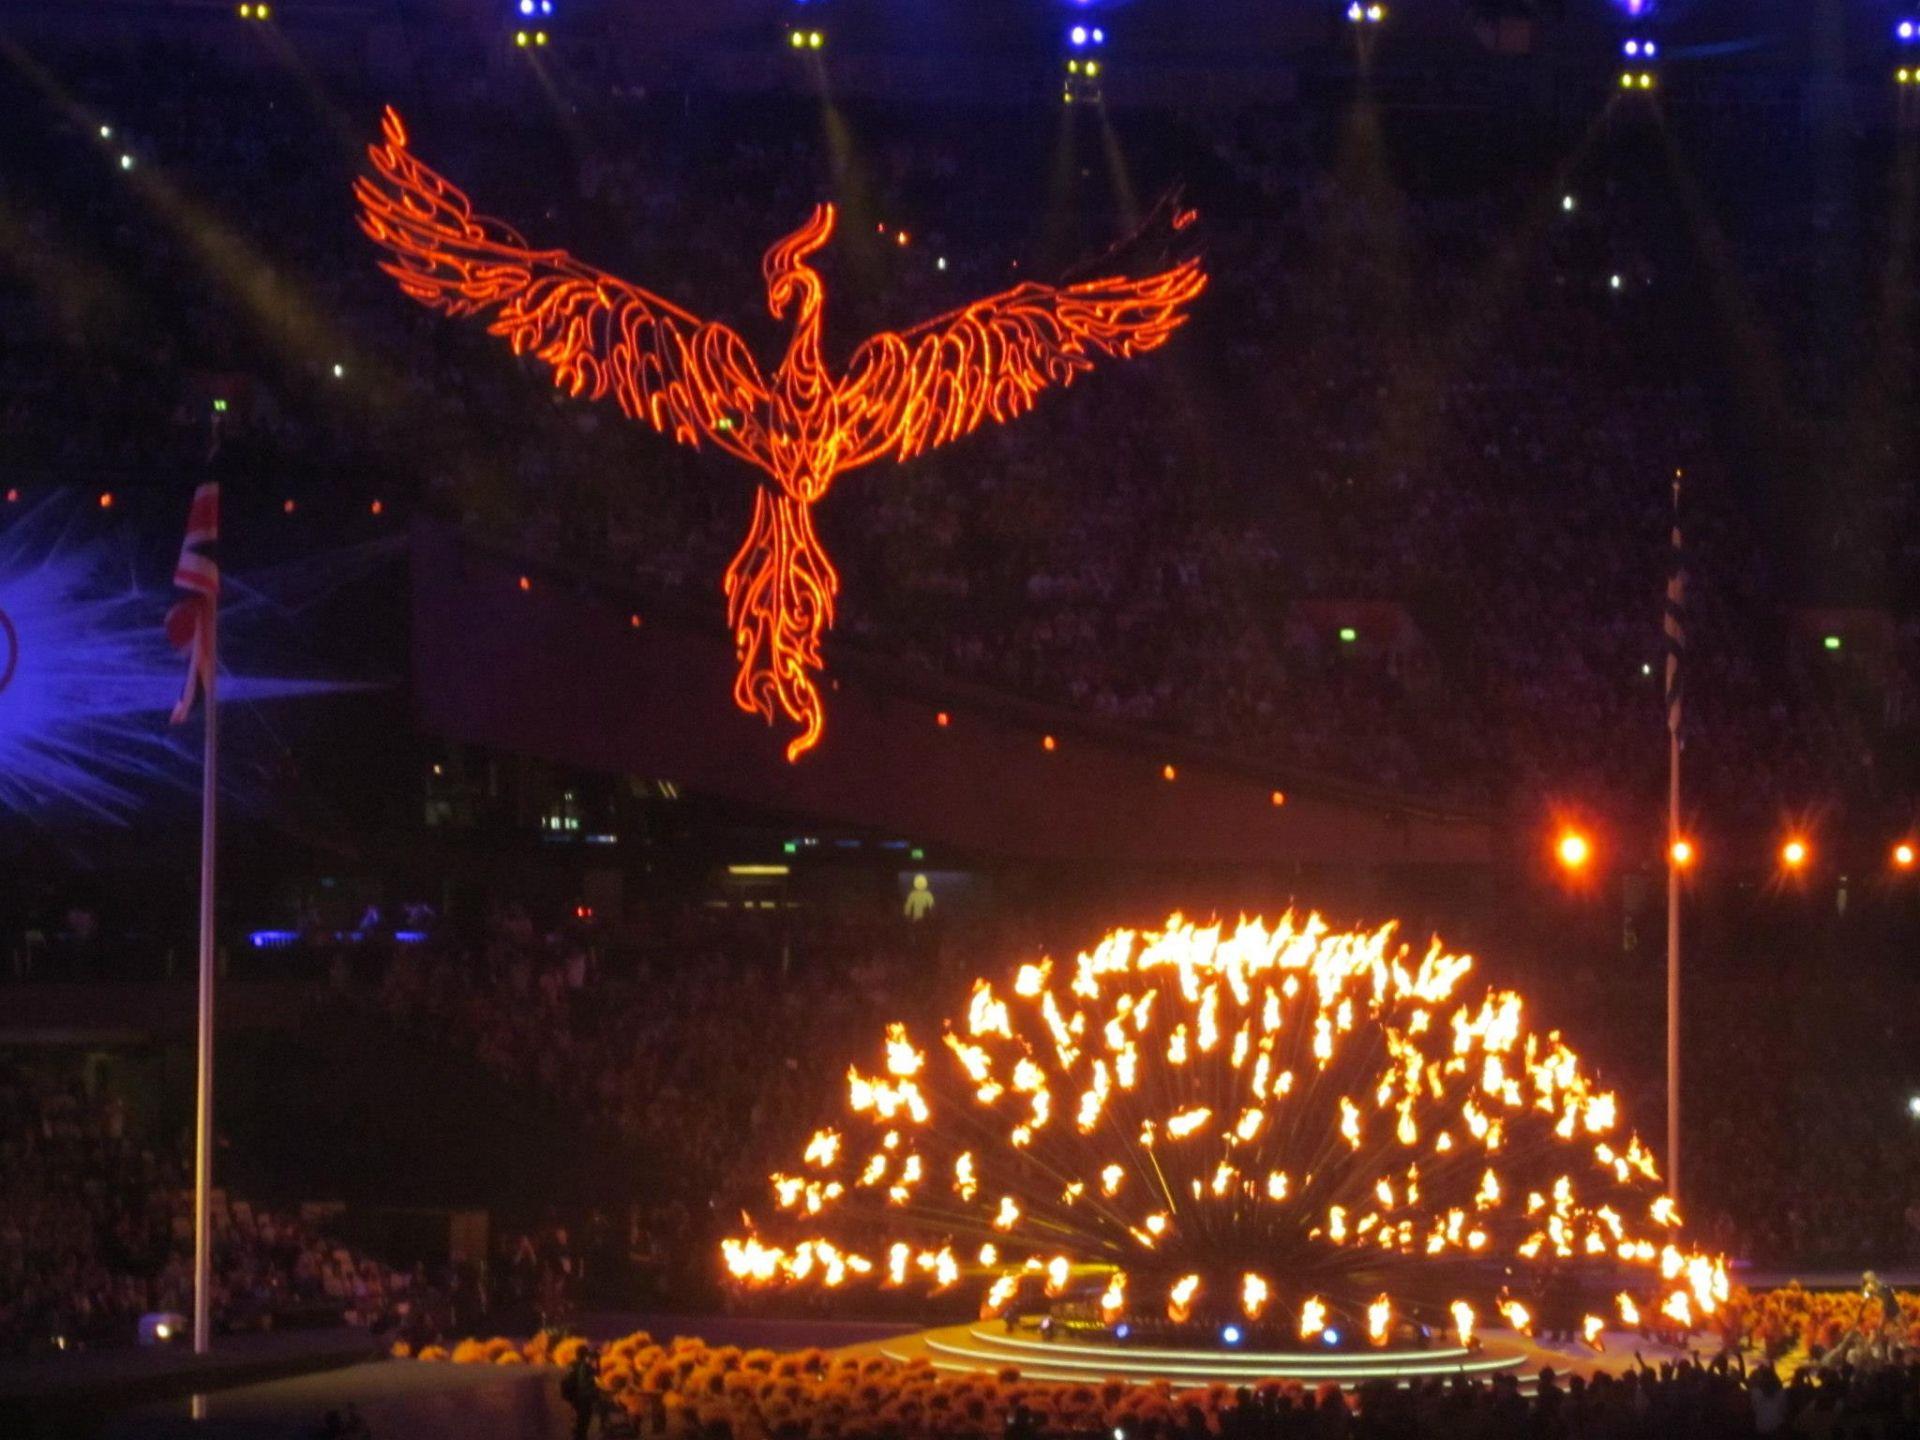 London 2012 Olympic Cauldron